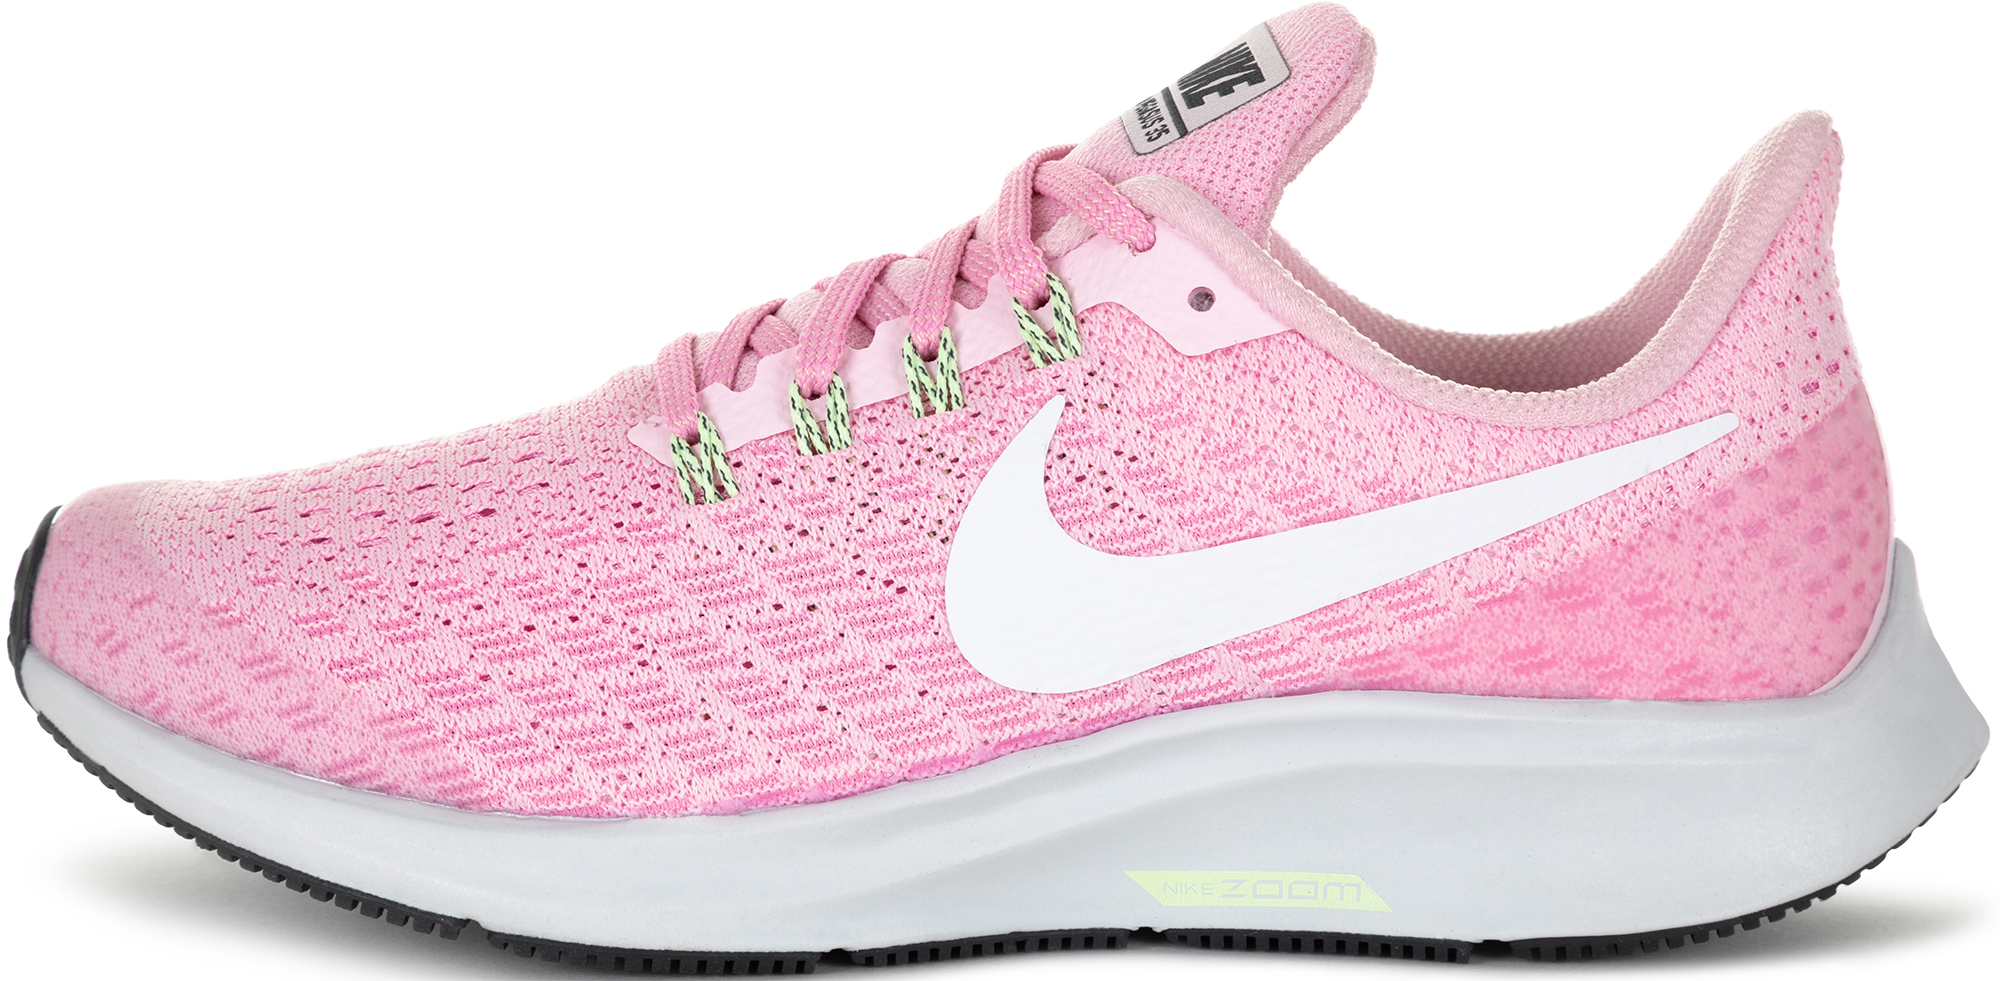 Nike Кроссовки для девочек Nike Air Zoom Pegasus 35, размер 39 цены онлайн